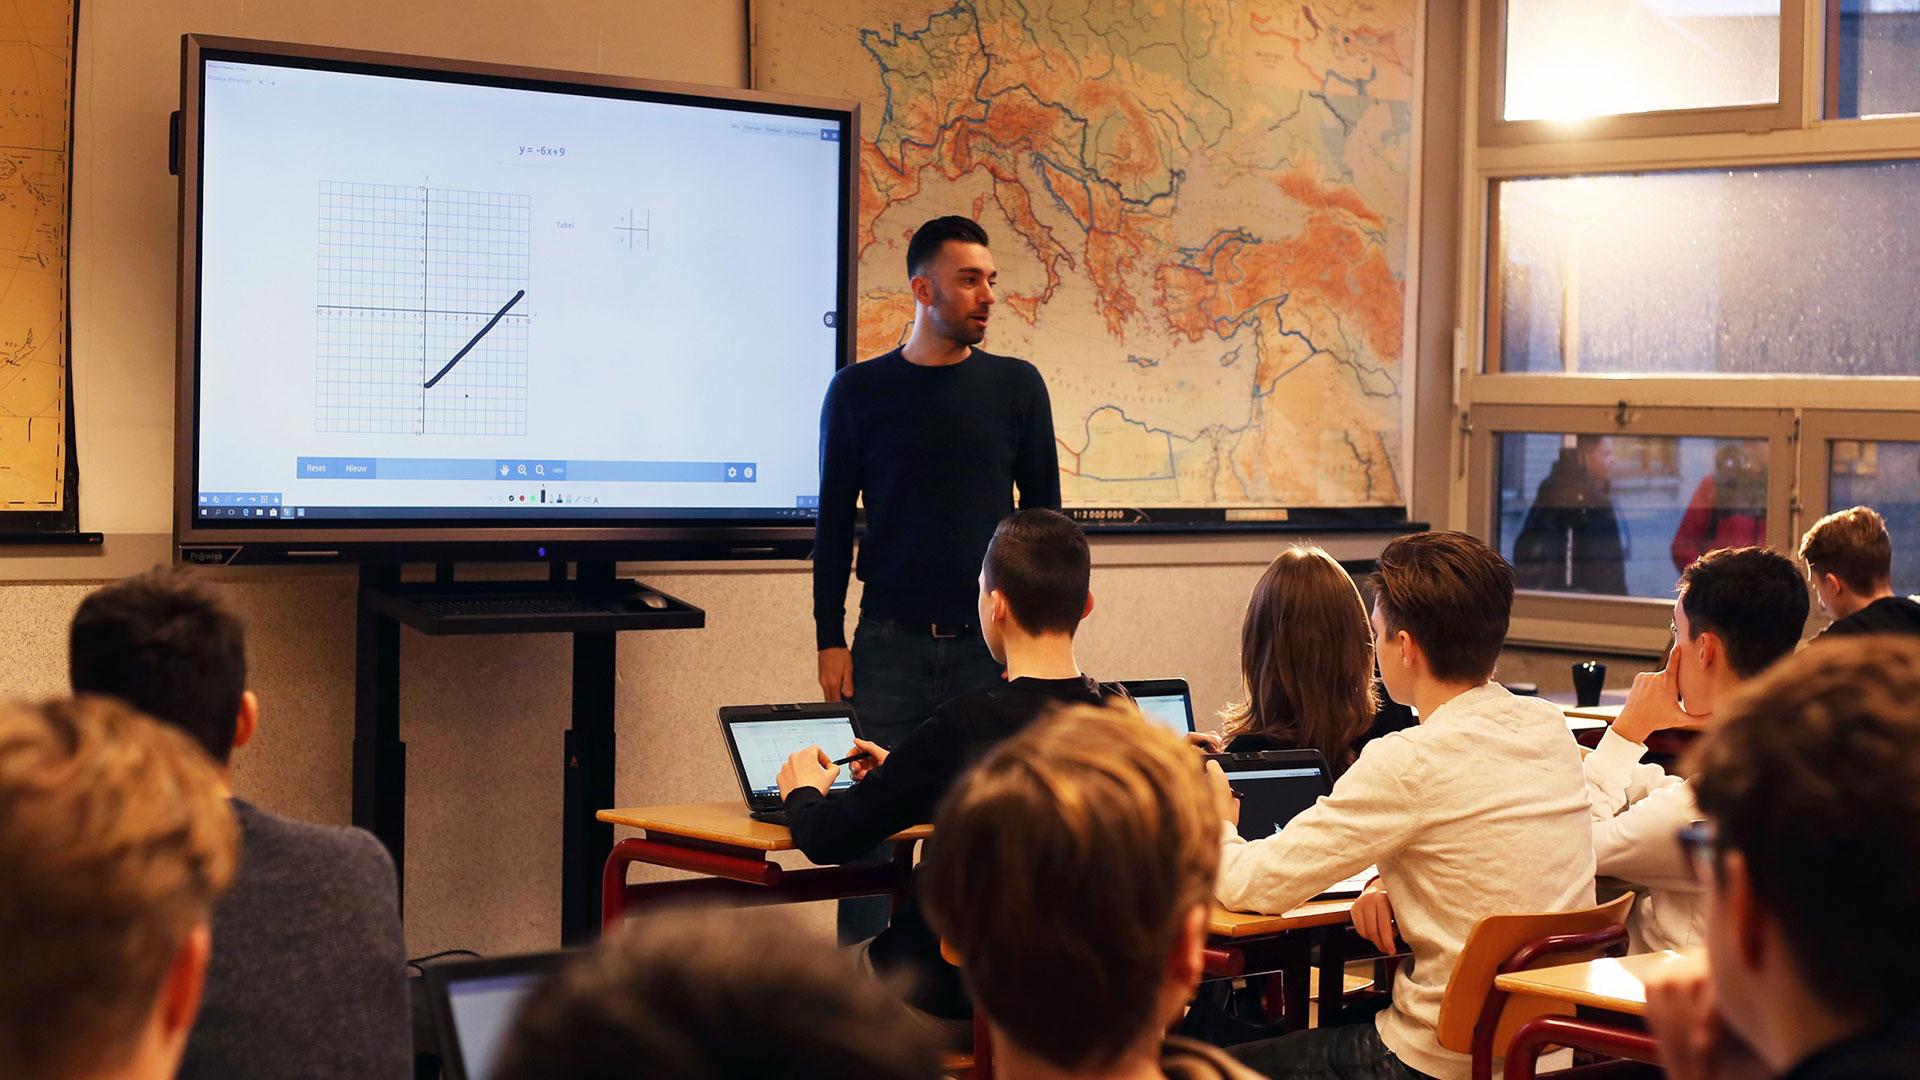 interaktiv-undervisning-prowise-touchscreen-klasserom